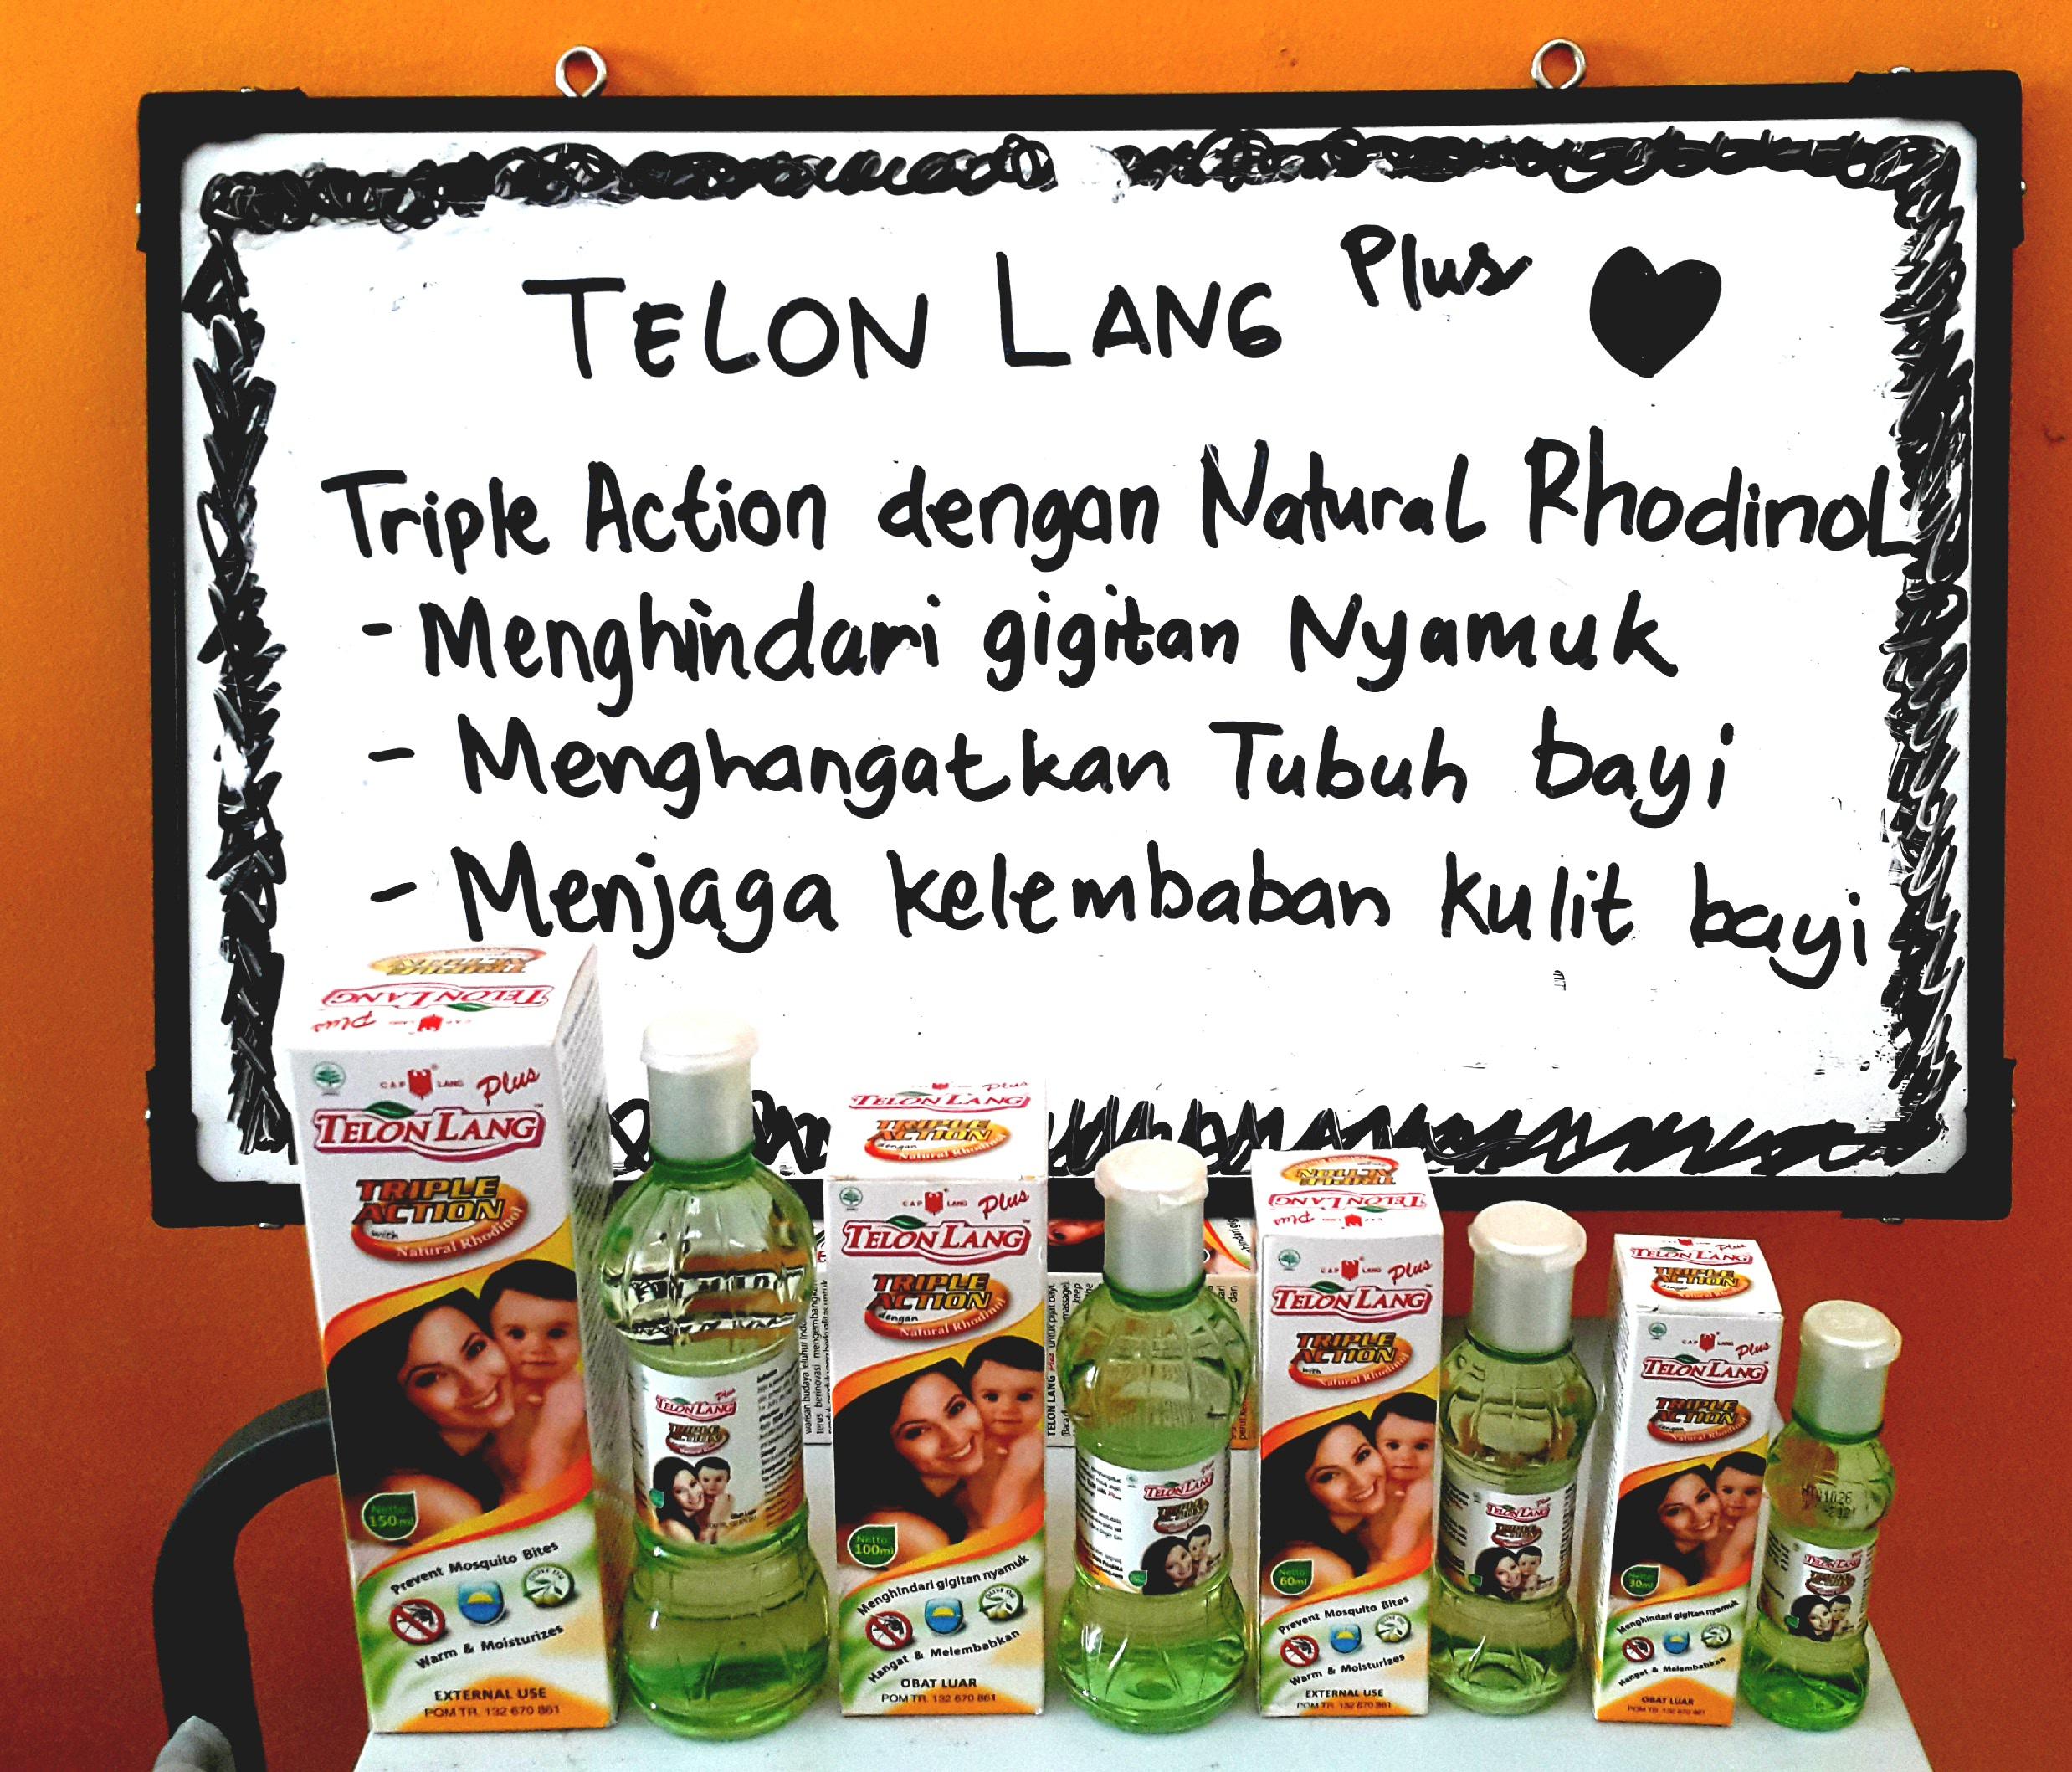 Telon Lang Plus tersedia dalam ukuran 30ml, 60ml, 100ml, 150ml